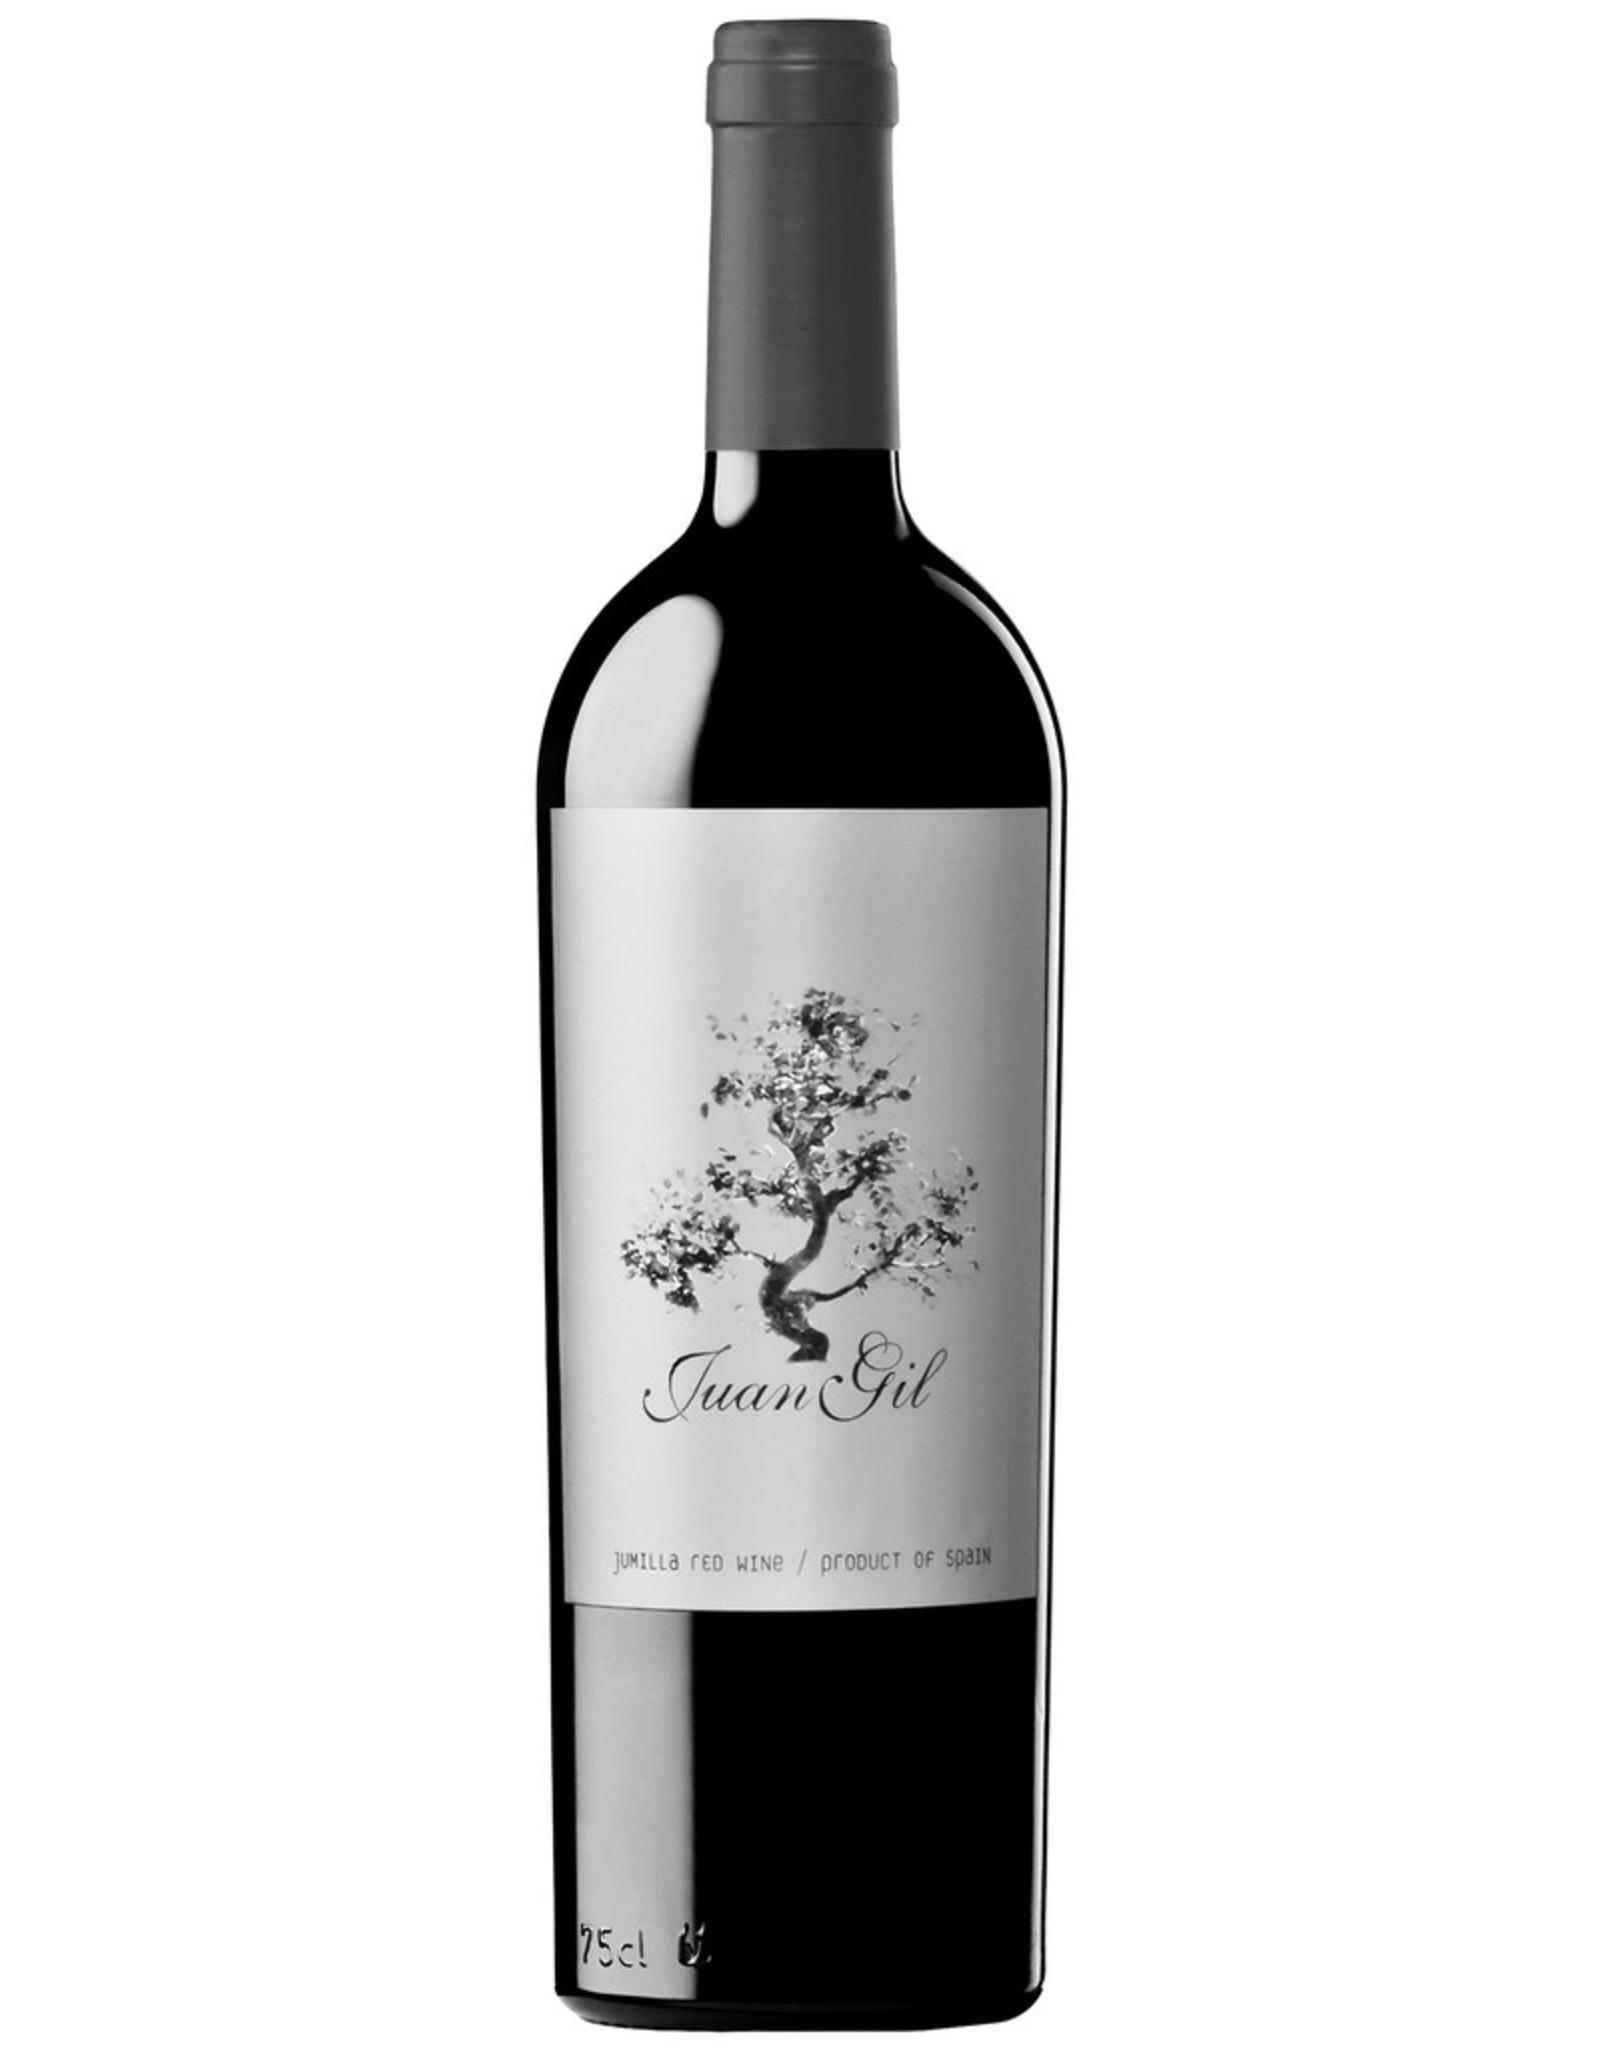 Red Wine 2017, Juan Gil Silver Label, Monastrell, Jumilla, Spain, 15.0% Alc, CTnr, TW91